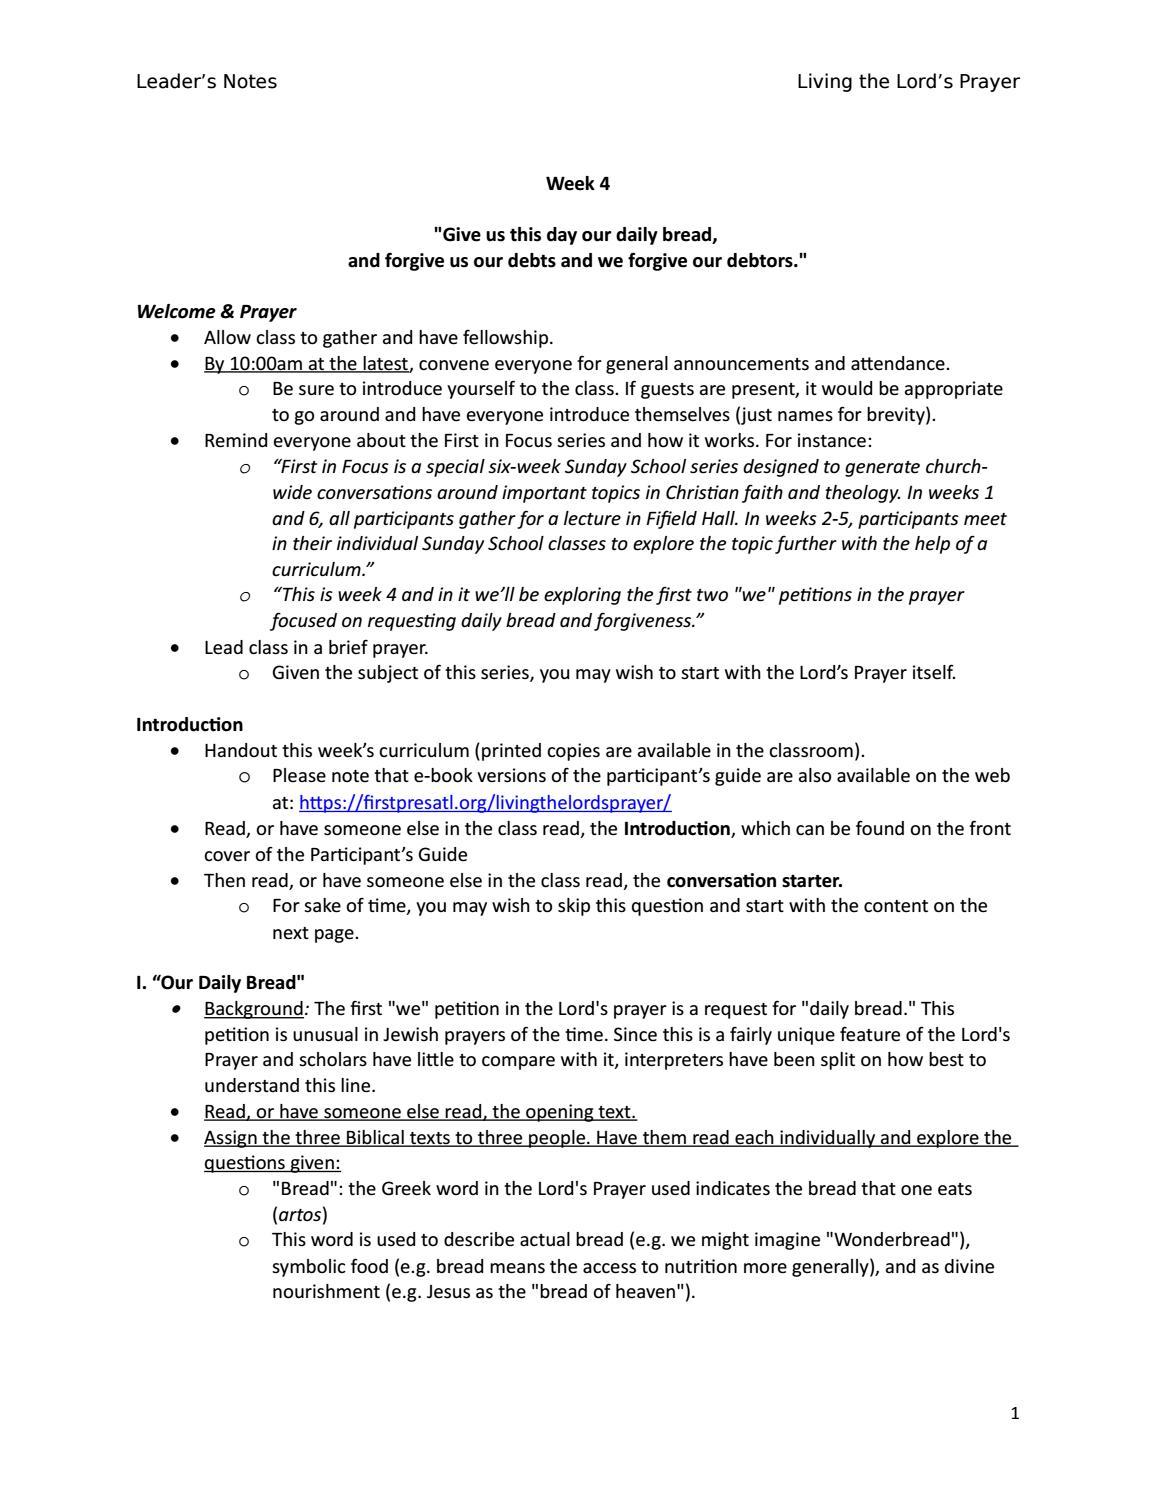 Leader's Notes by First Presbyterian Church of Atlanta - issuu